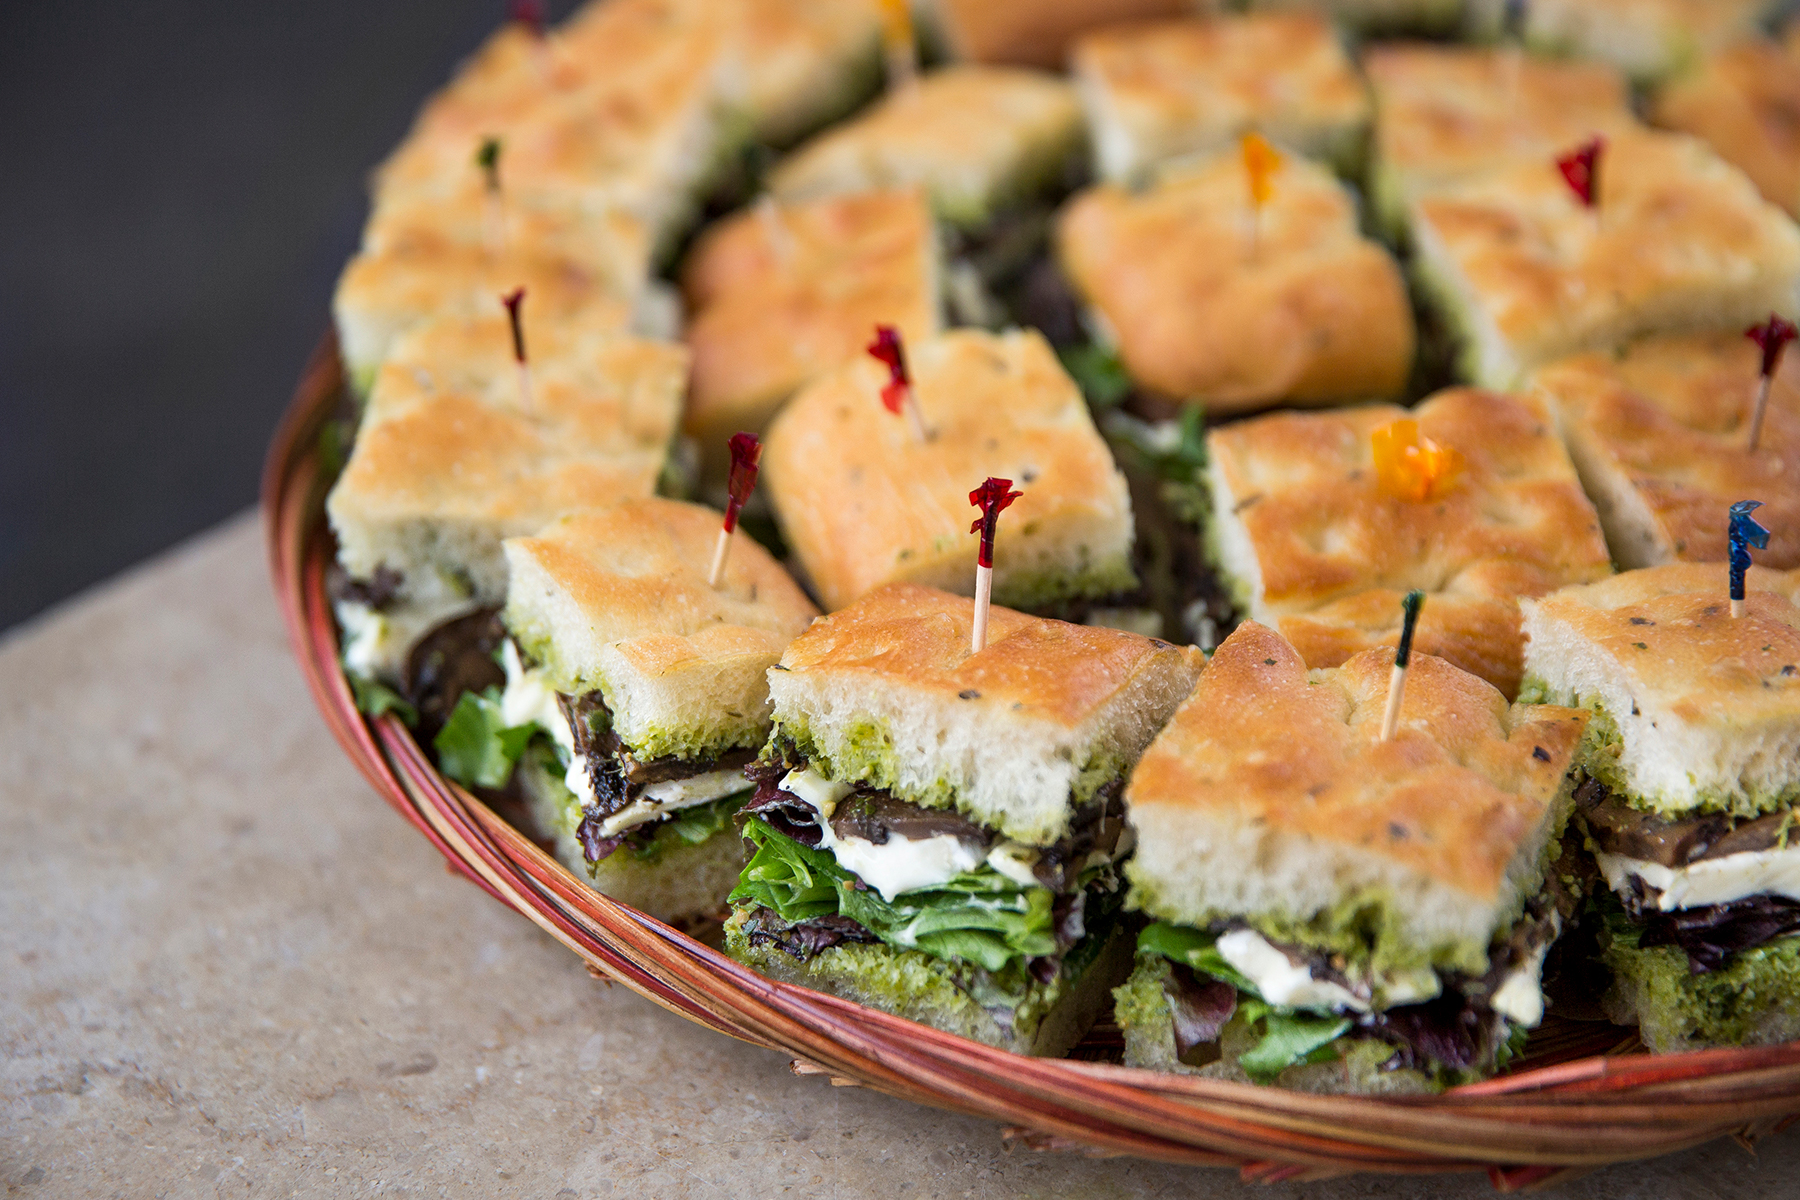 Image result for Sandwich platters